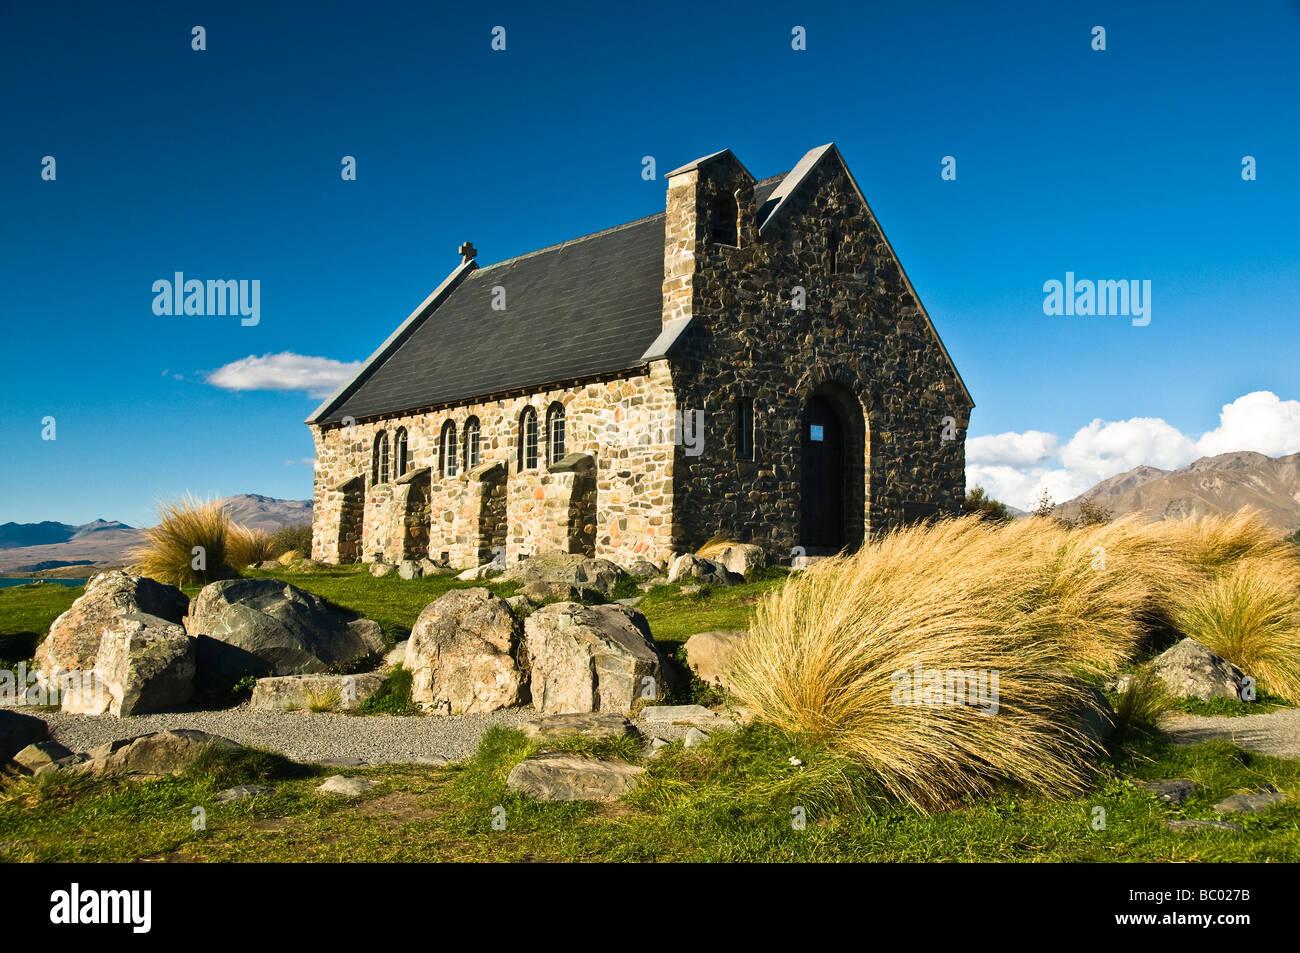 Church of the Good Shepherd Lake Tekapo South Island New Zealand - Stock Image